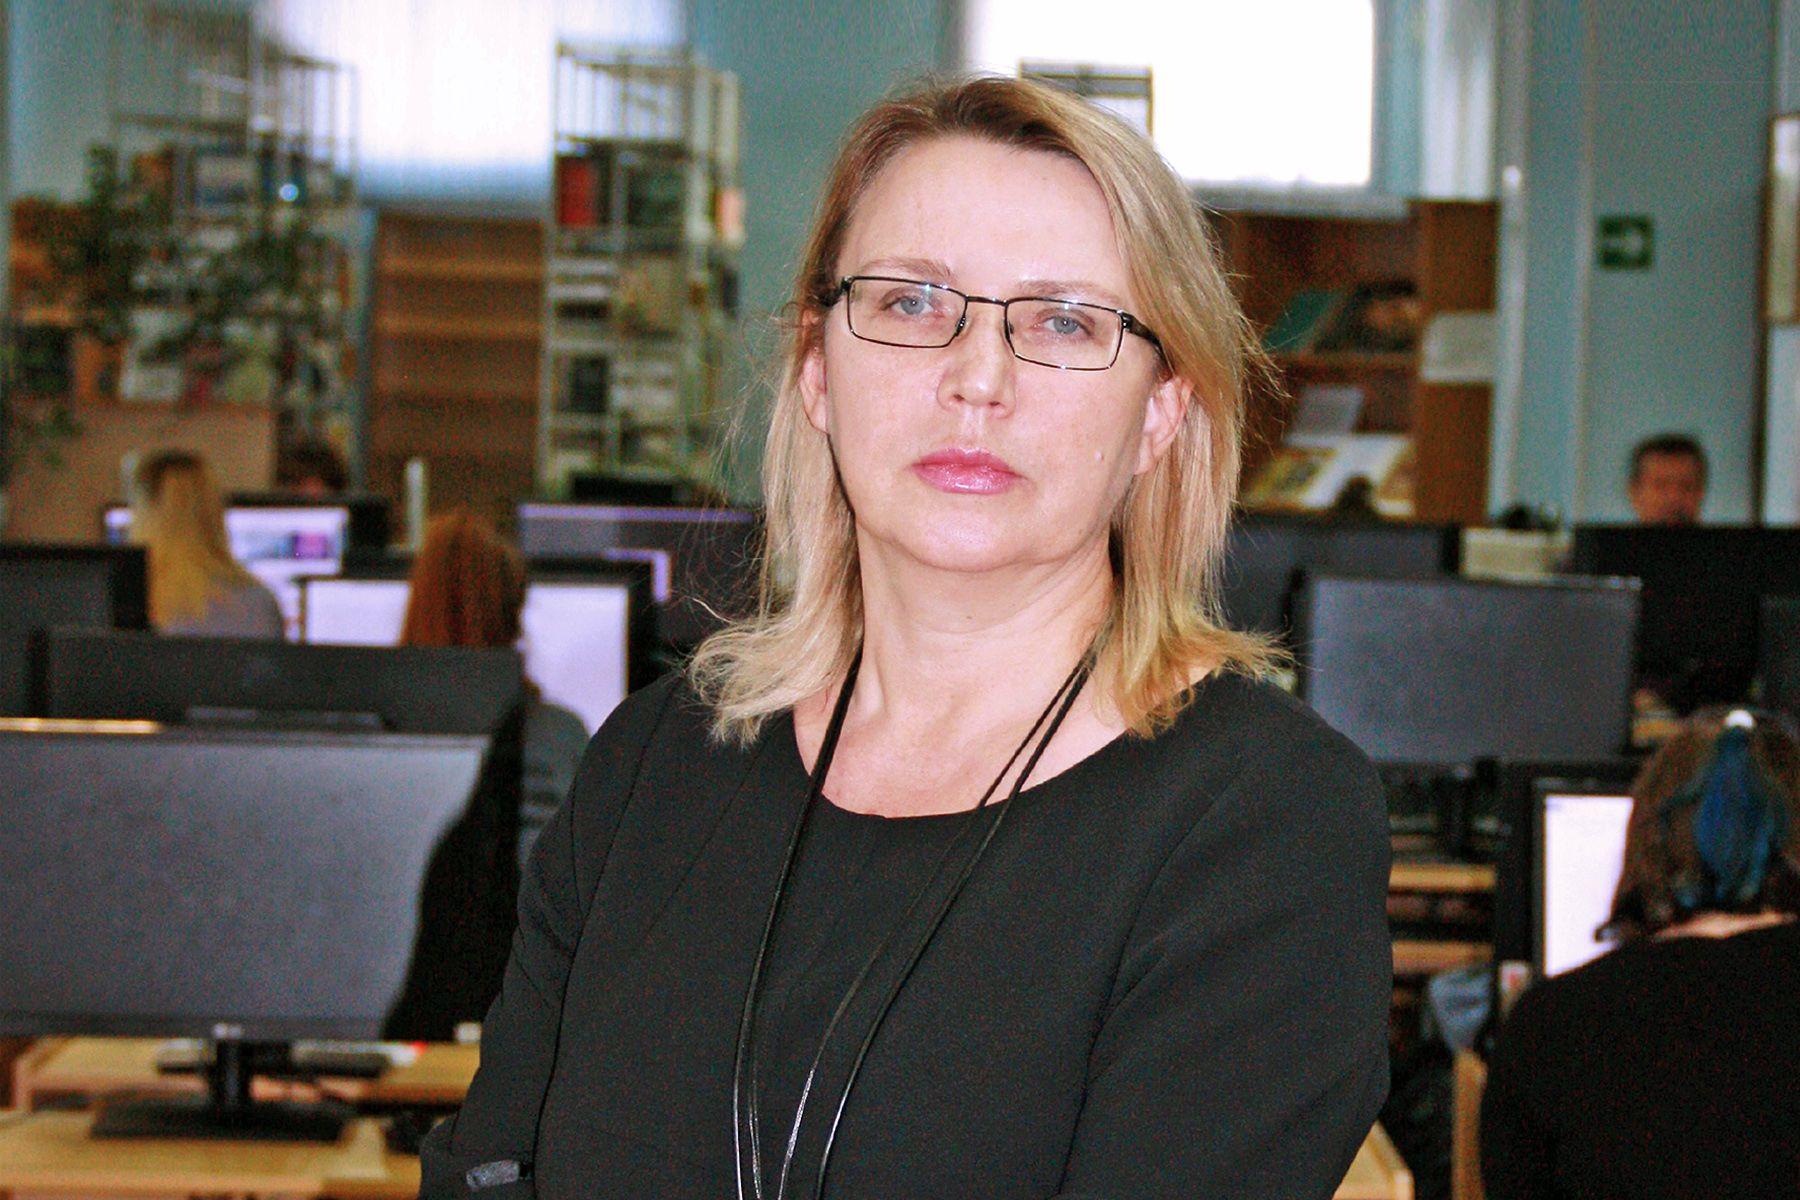 Директор Института права ВГУЭС Светлана Литвинова: Юрист – это образ жизни